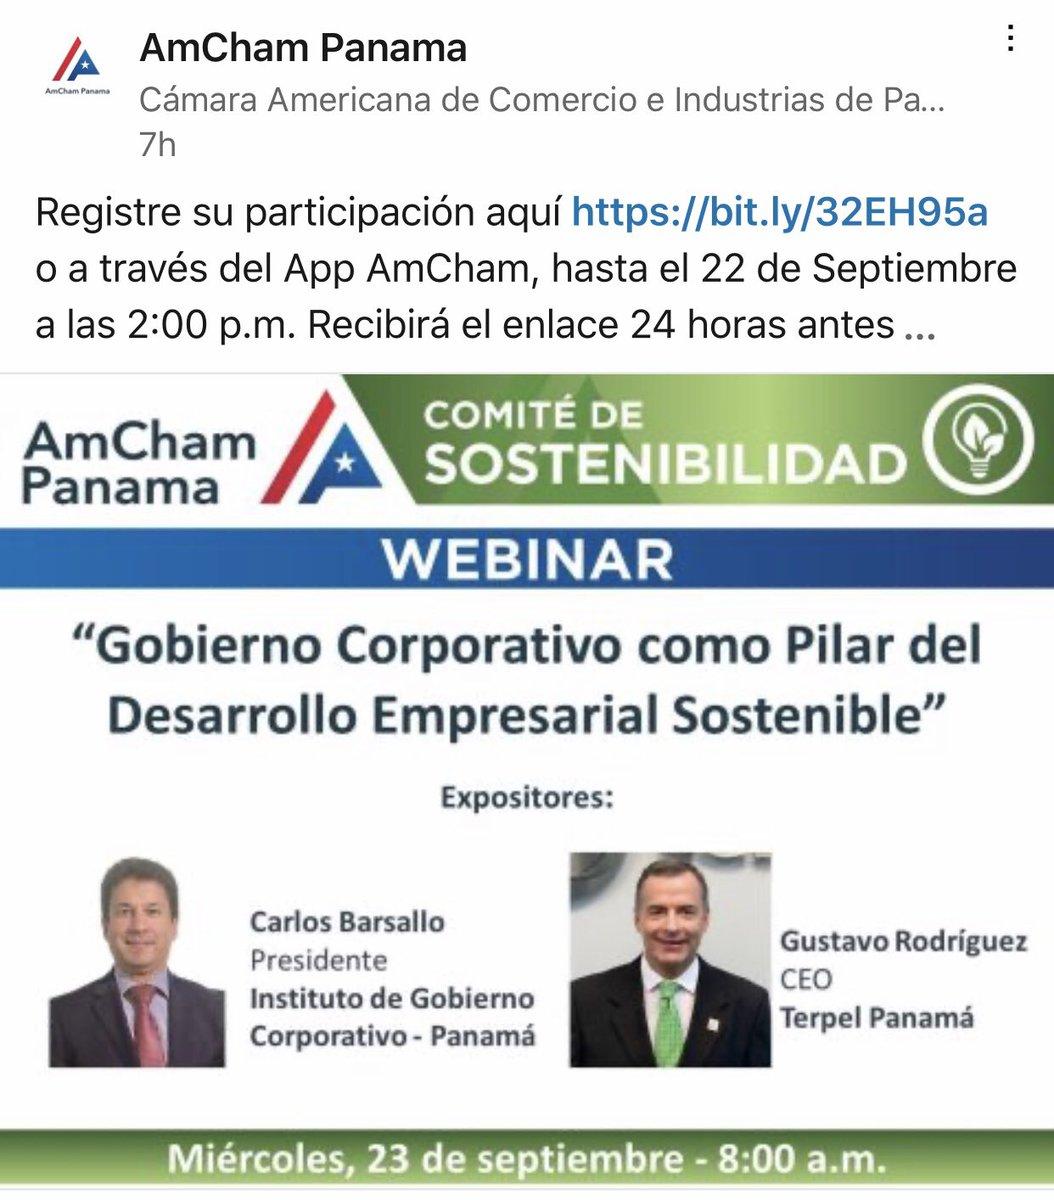 #Panama #corpgov #Gobiernocorporativo #AMCHAM #sostenibilidad https://t.co/eZLdGkuJ9q